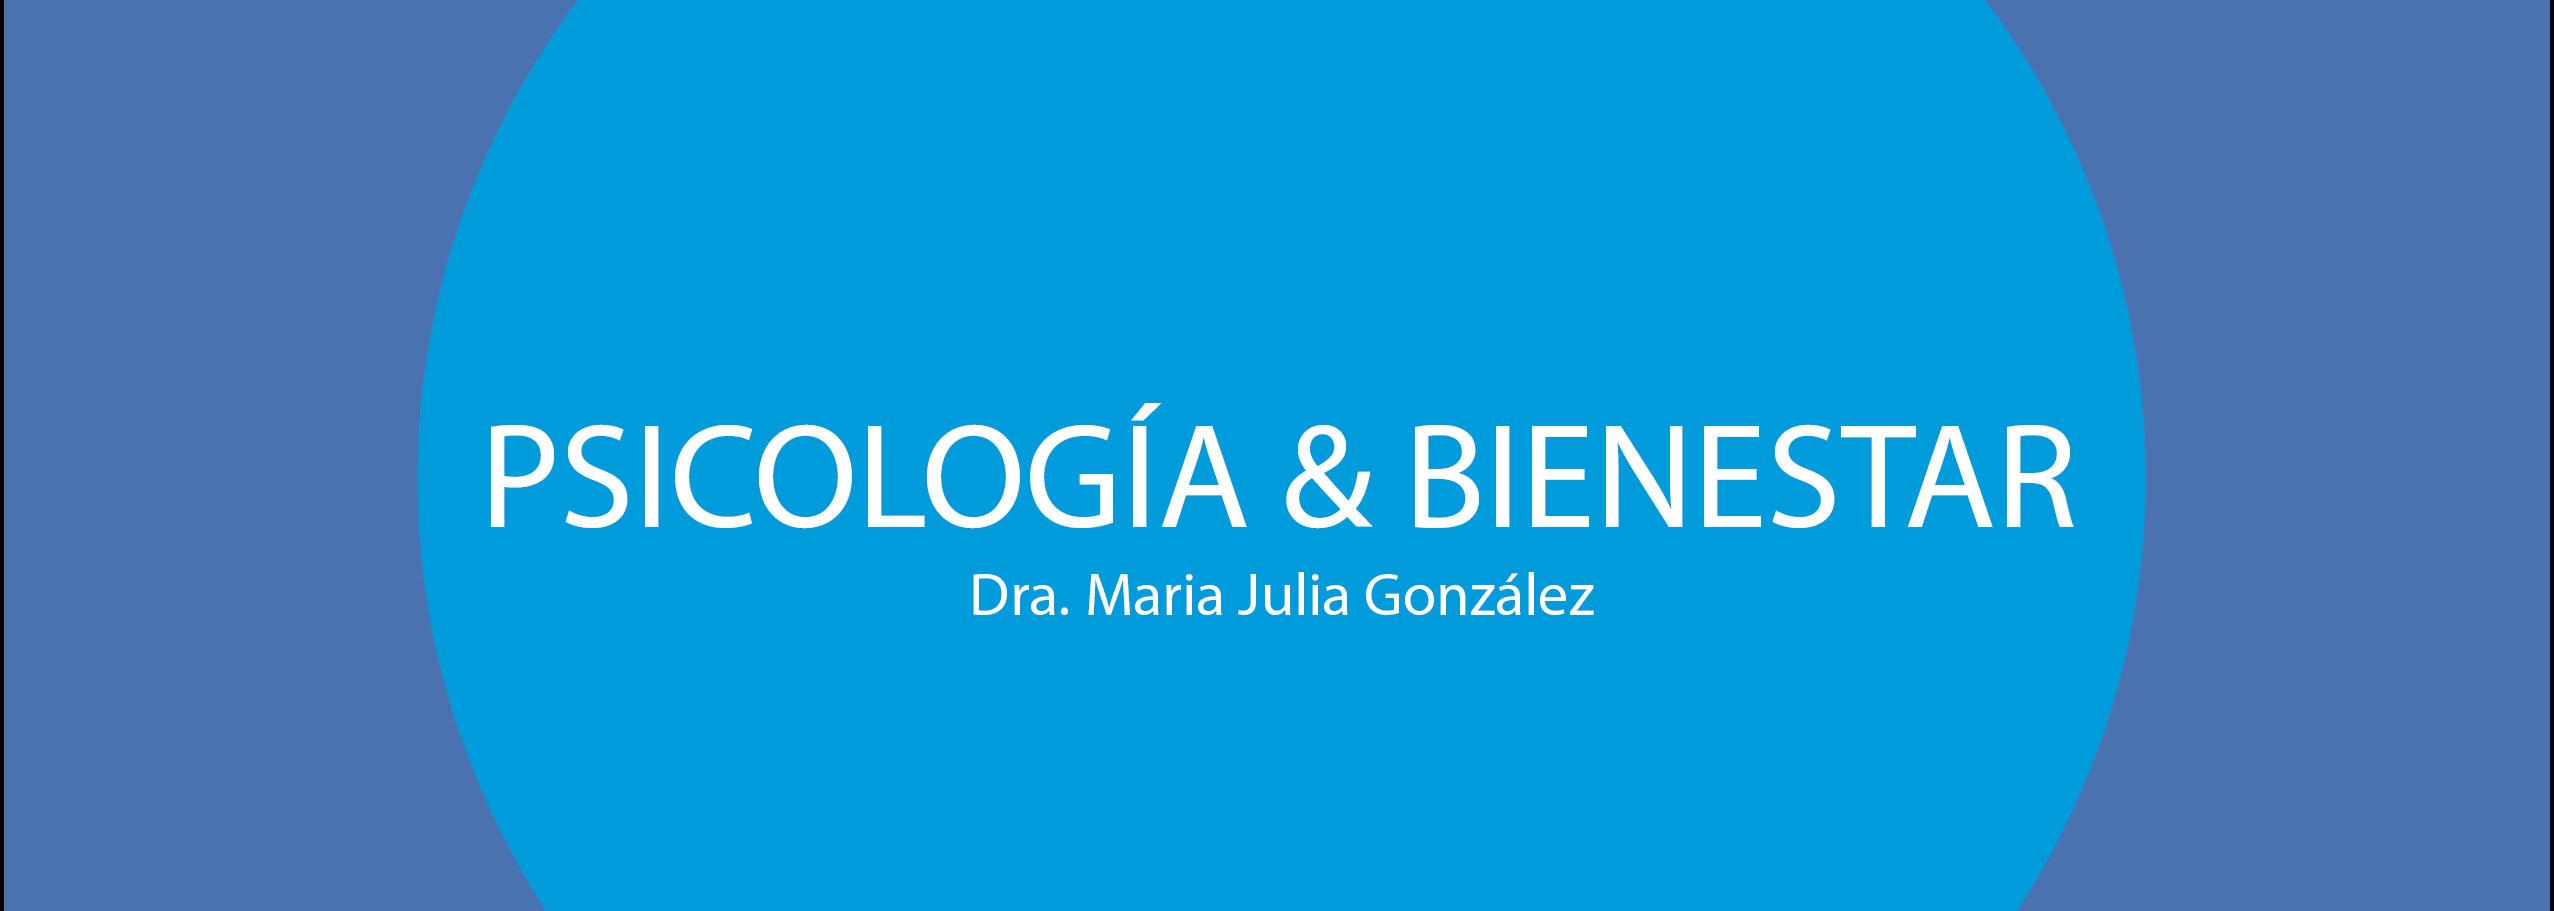 Dra. Maria Julia Gonzaléz